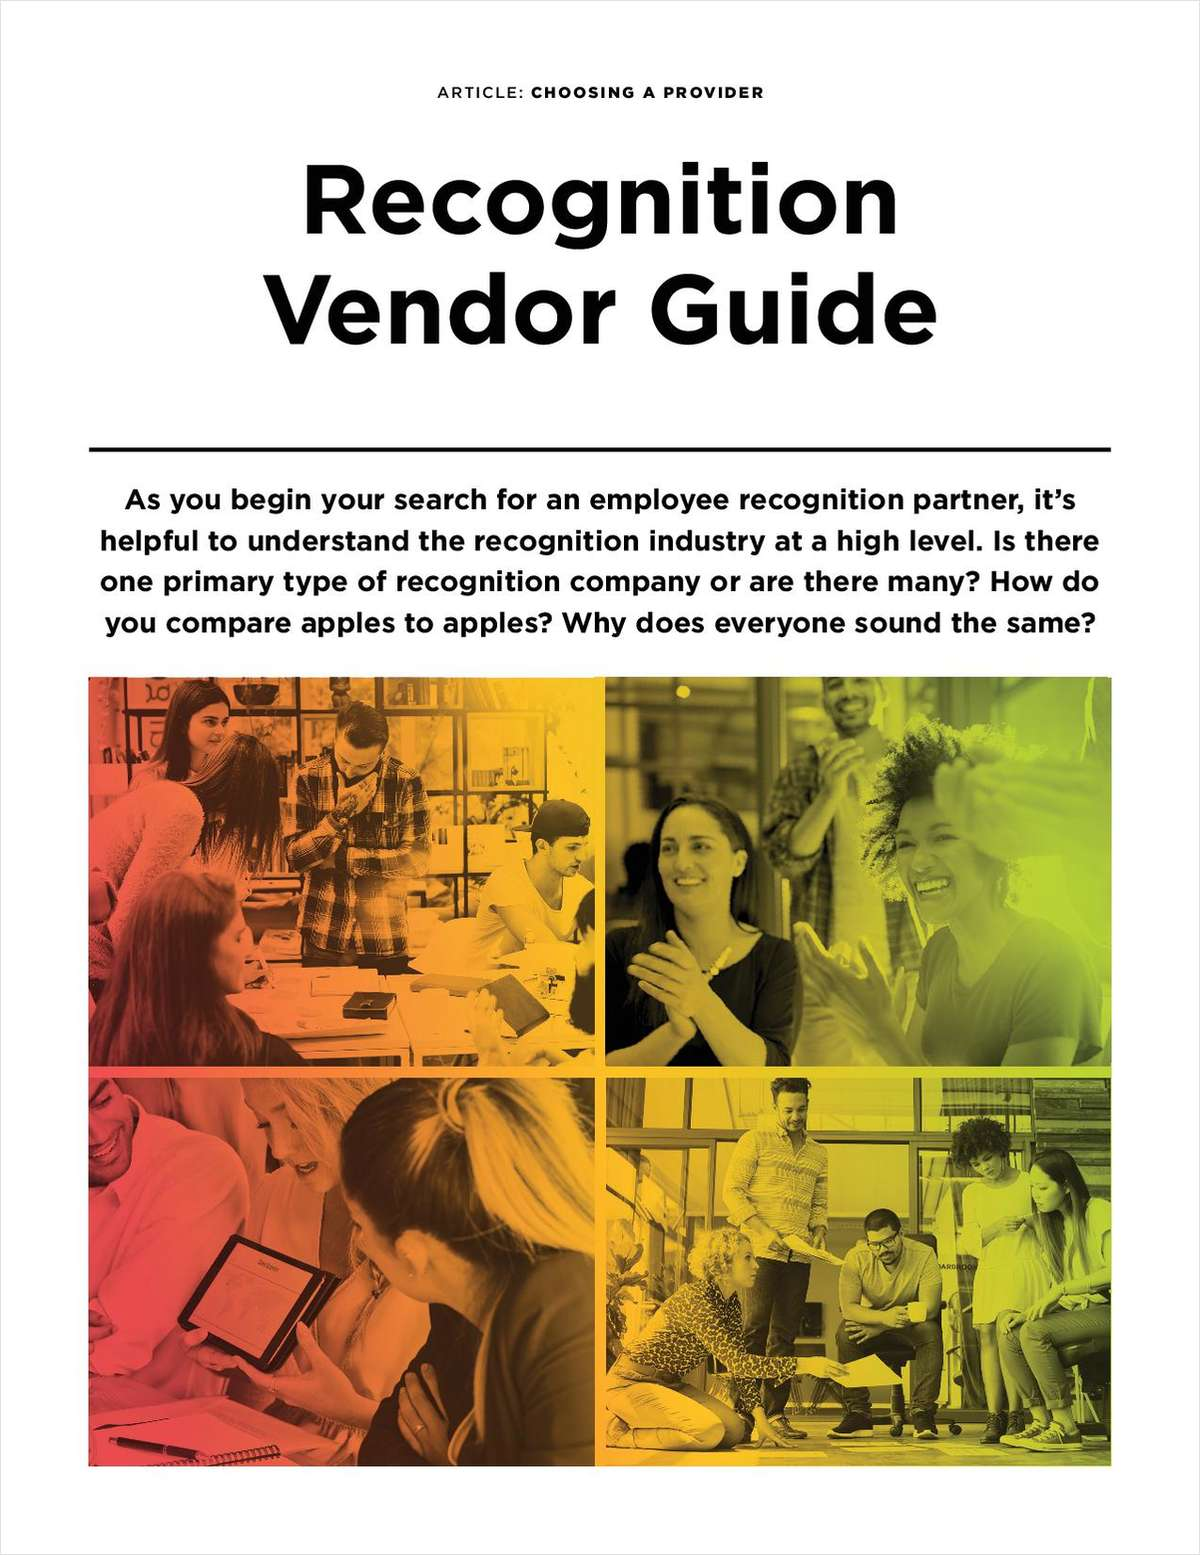 Recognition Vendor Guide